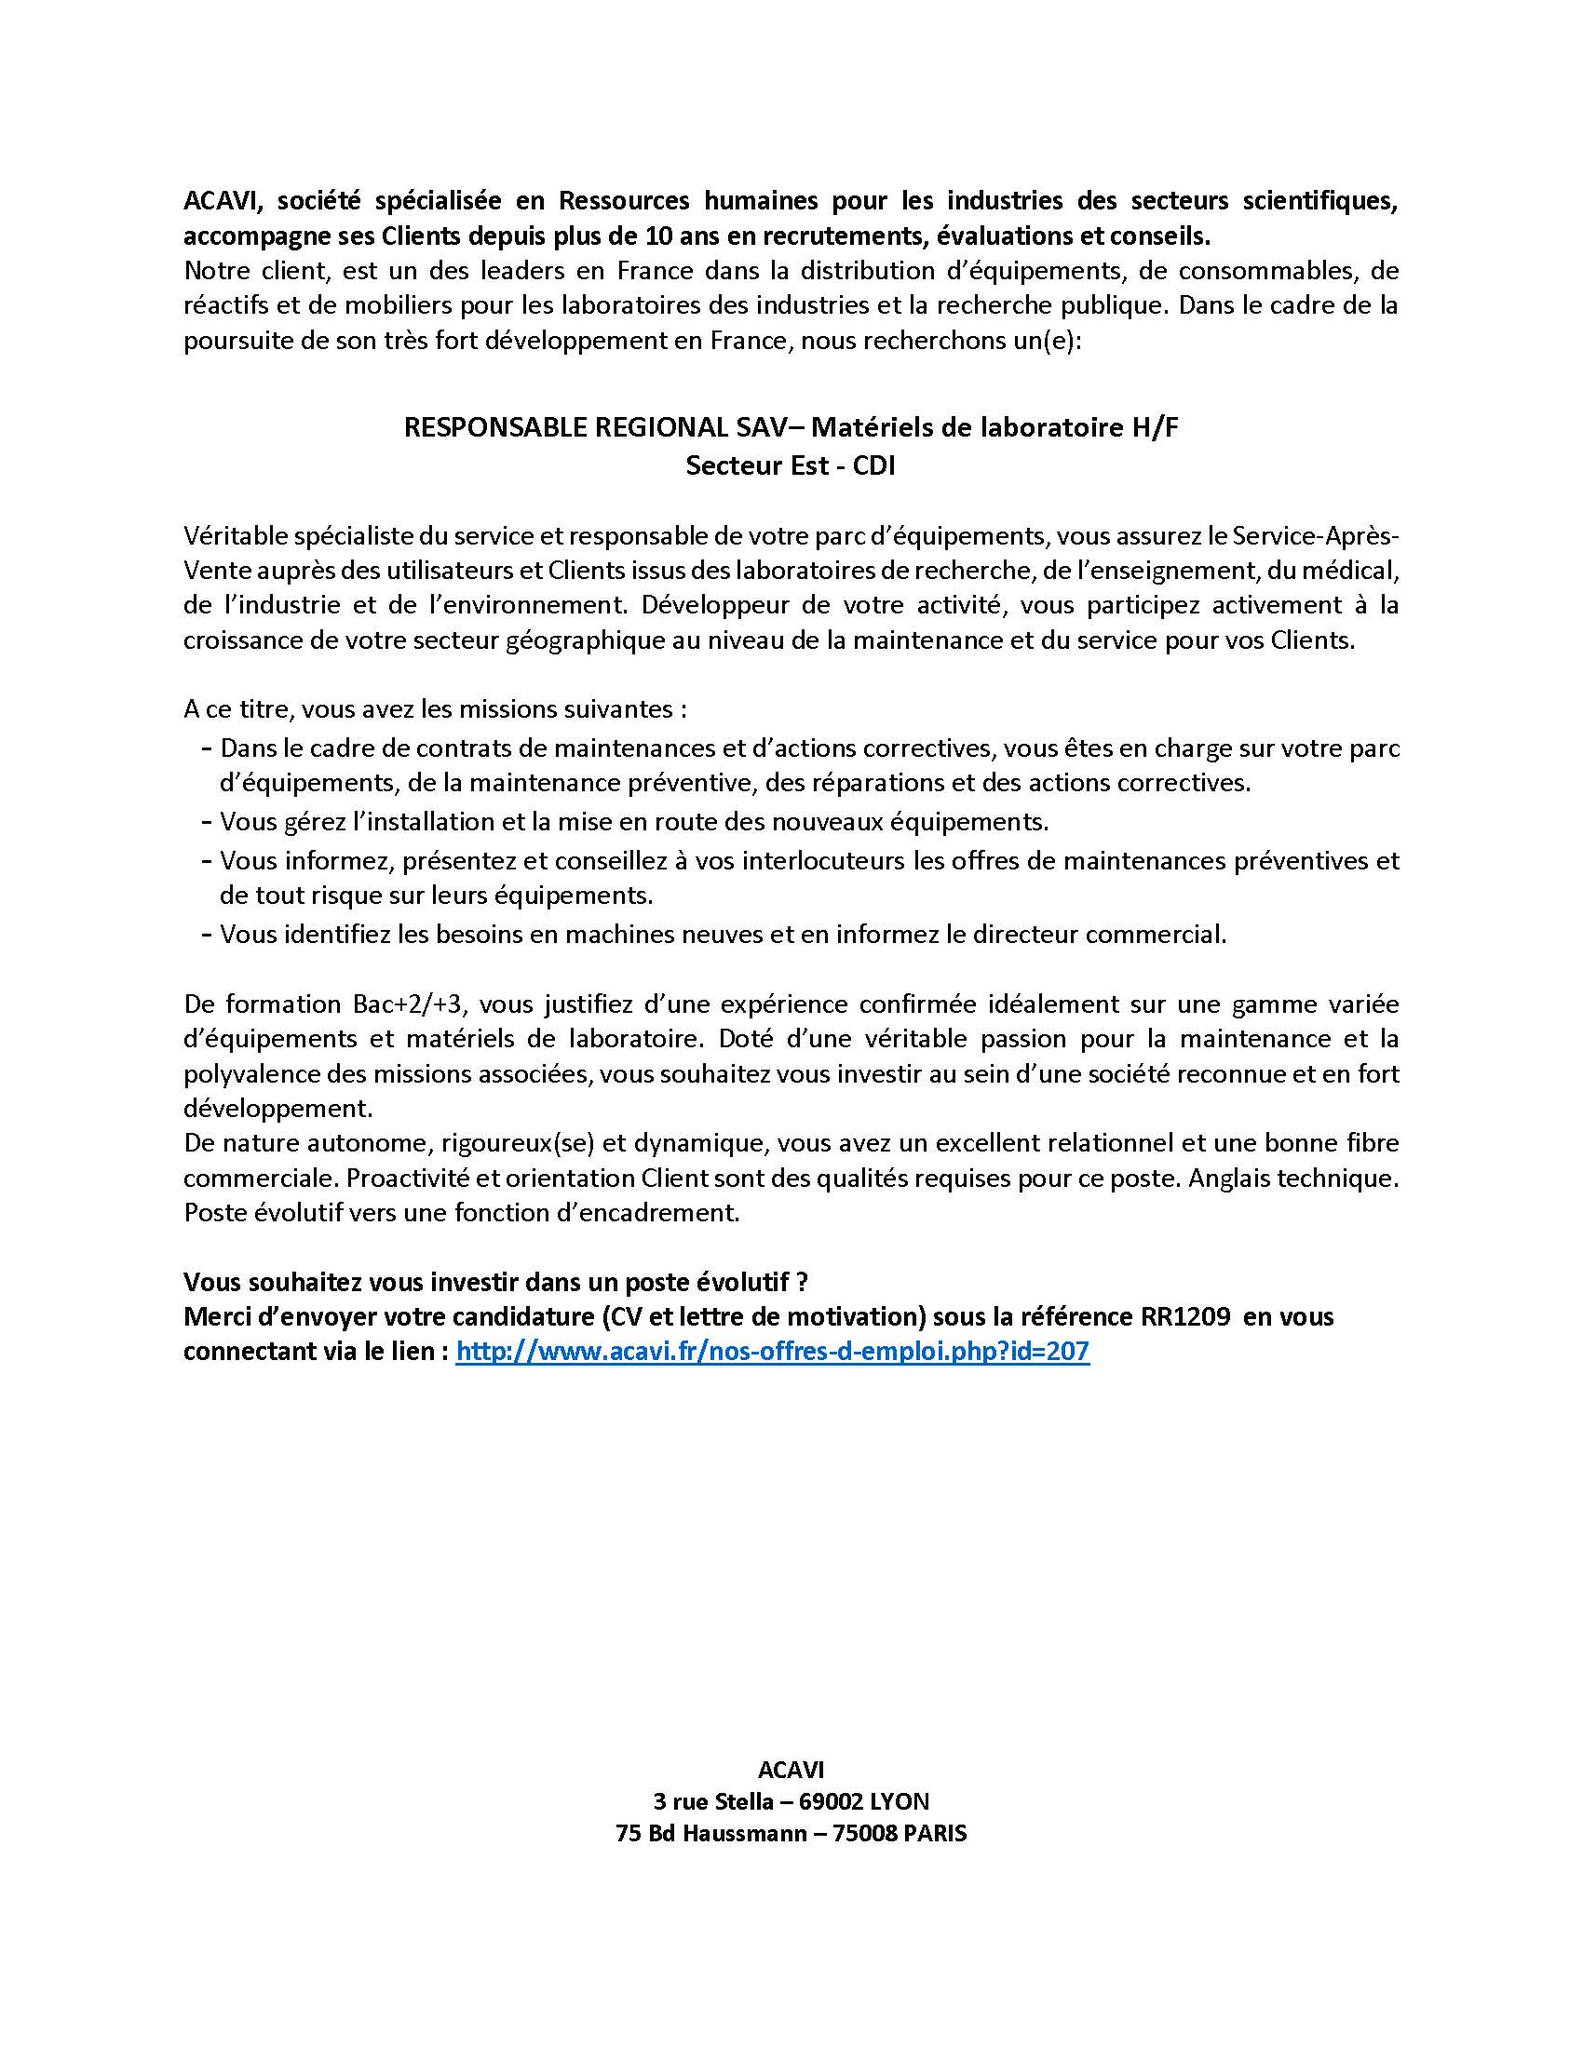 Acavi Jobs On Twitter Emploi Nouveauposte Responsable